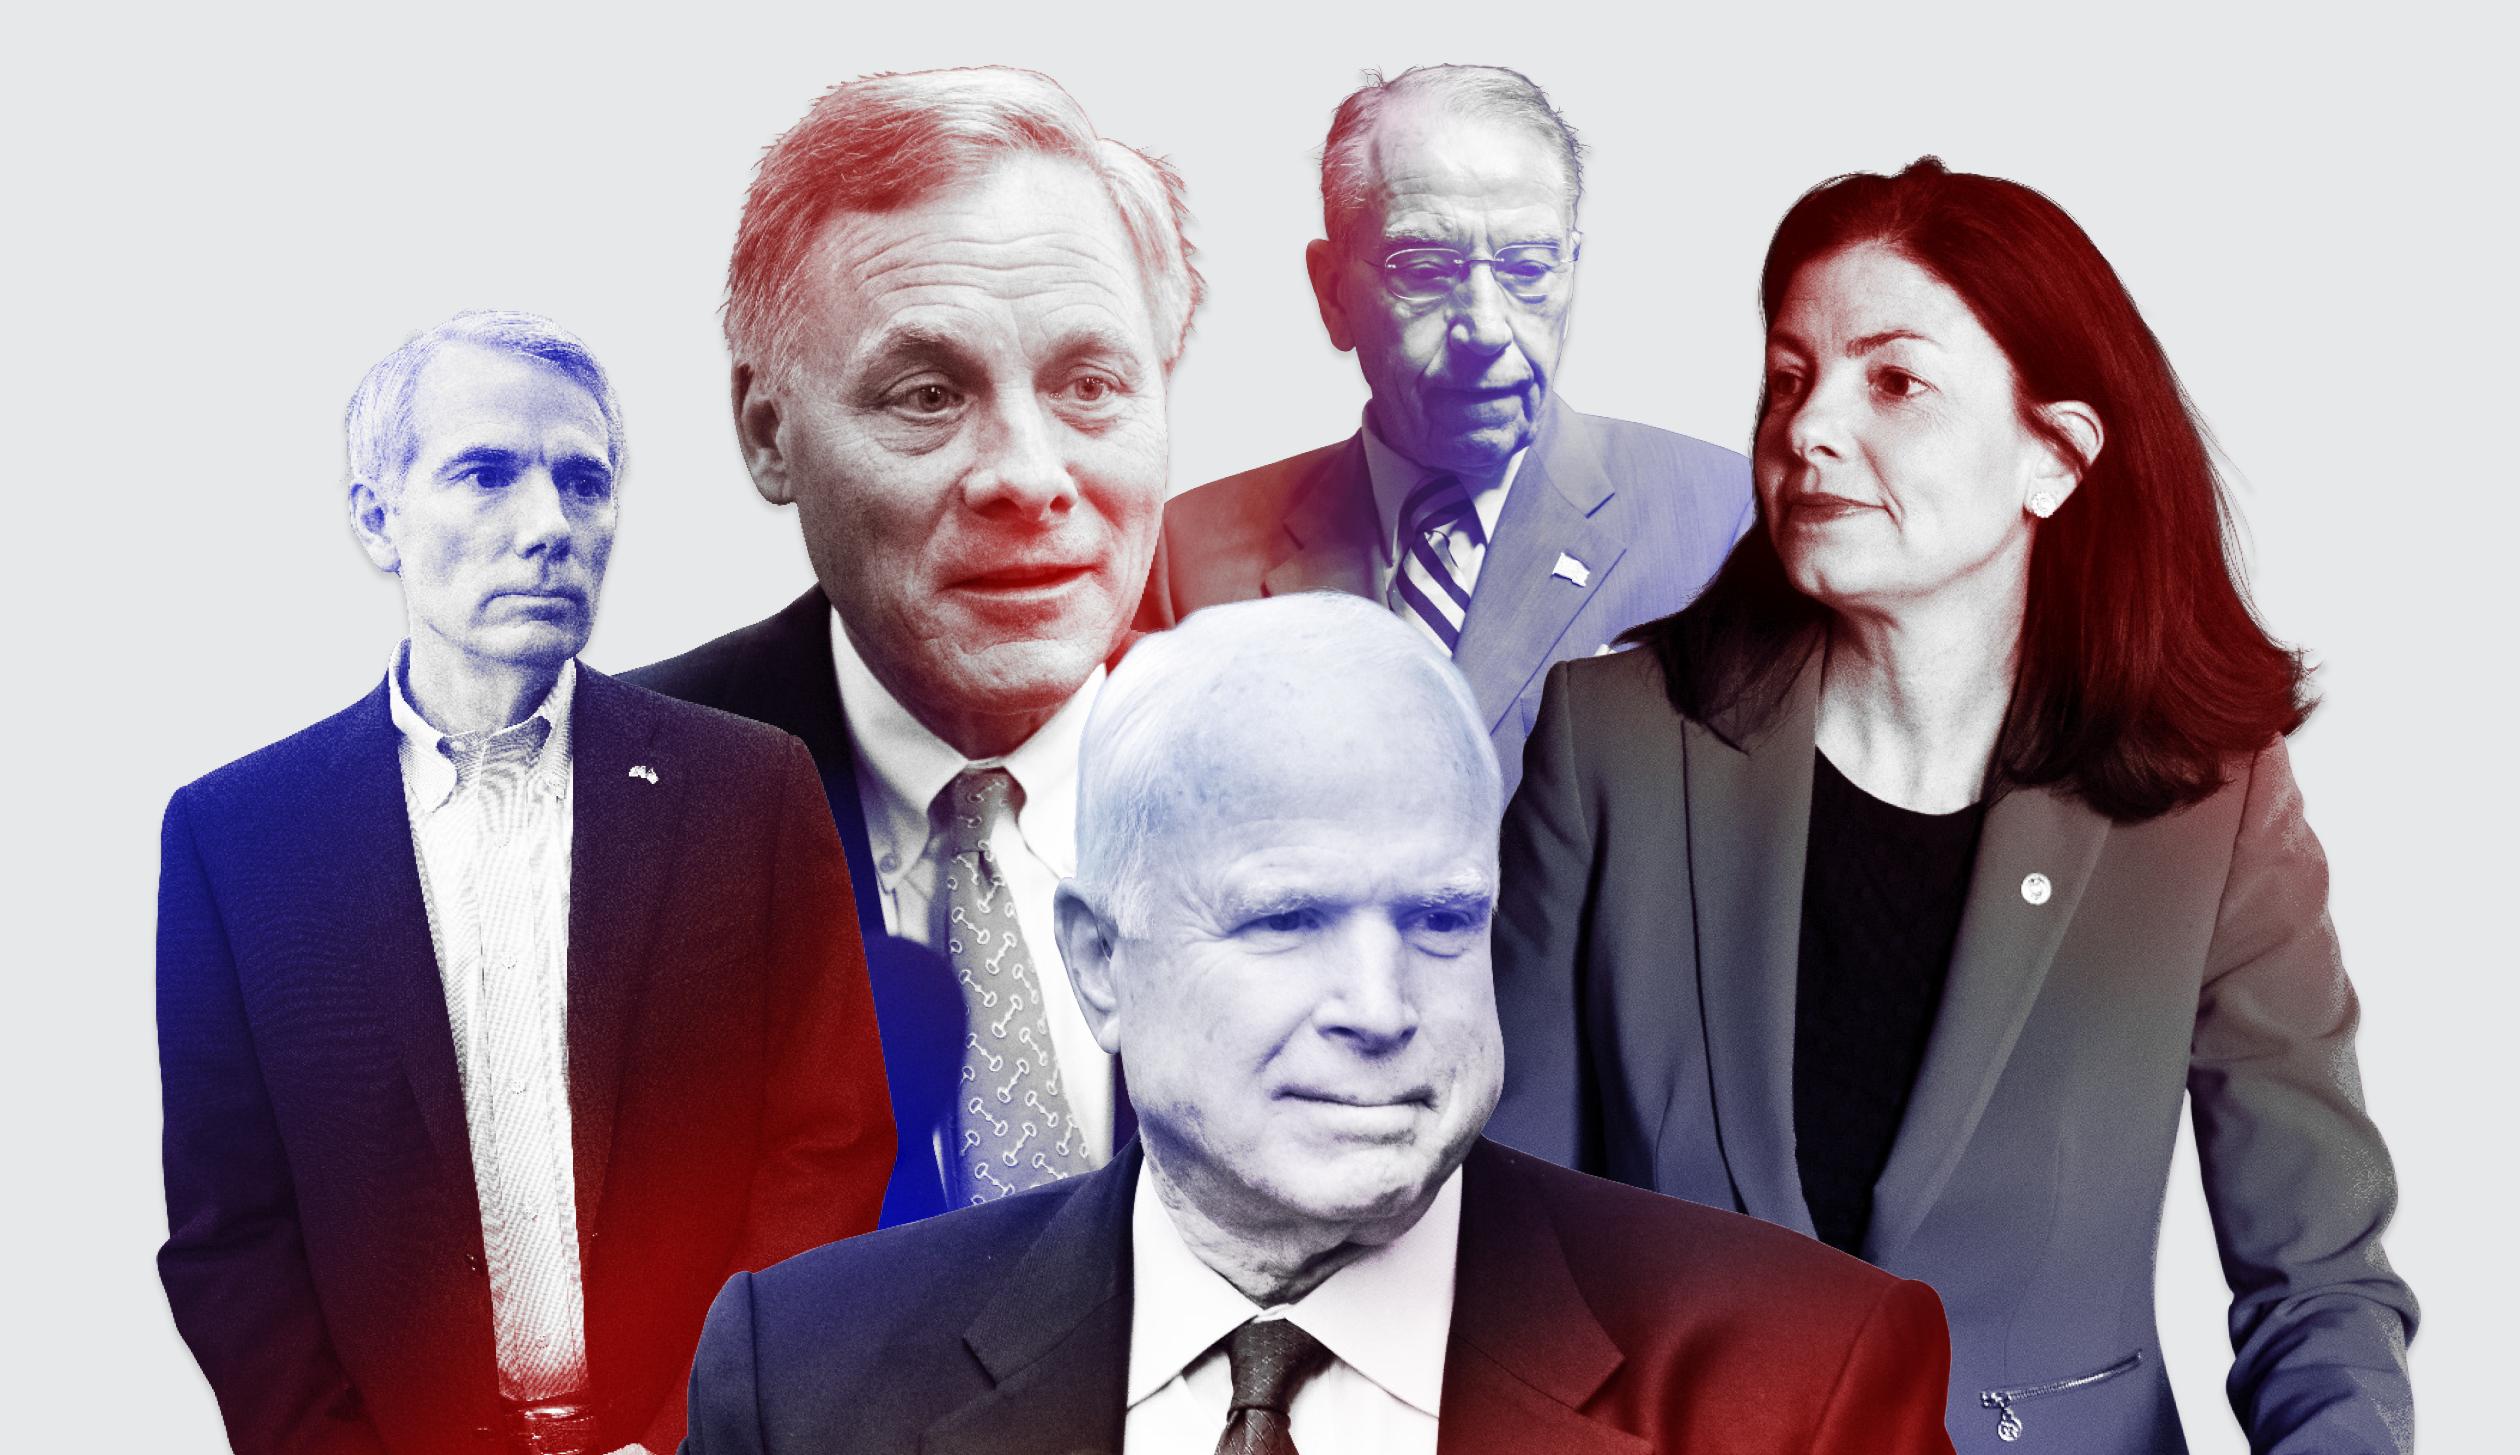 Rob Portman, left, Richard Burr, Chuck Grassley, Kelly Ayotte, and John McCain, front